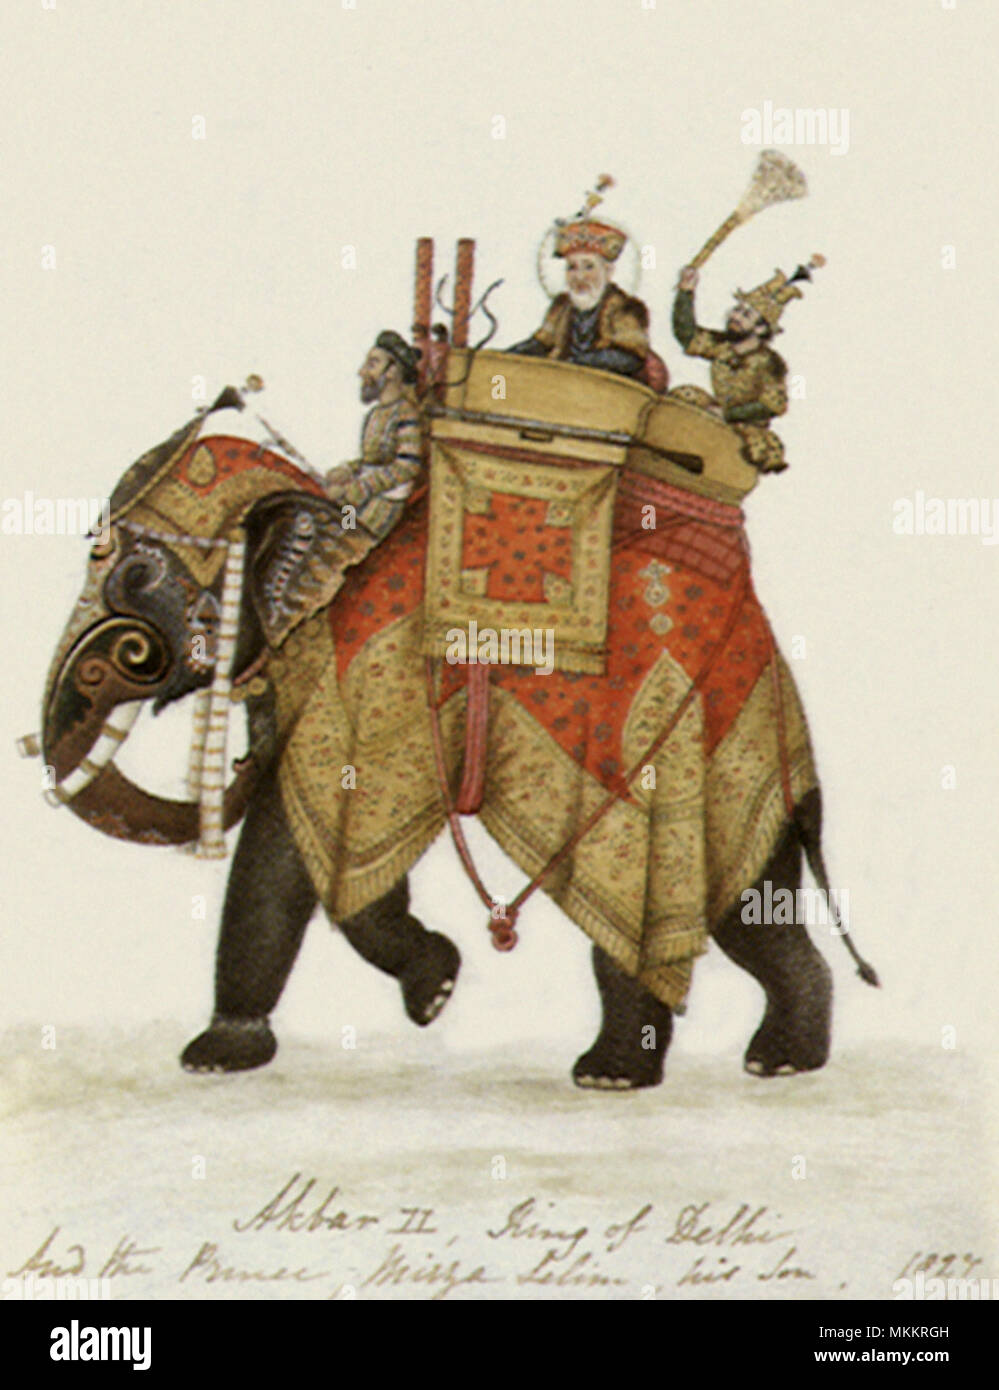 Akbar and Son on Elephant - Stock Image